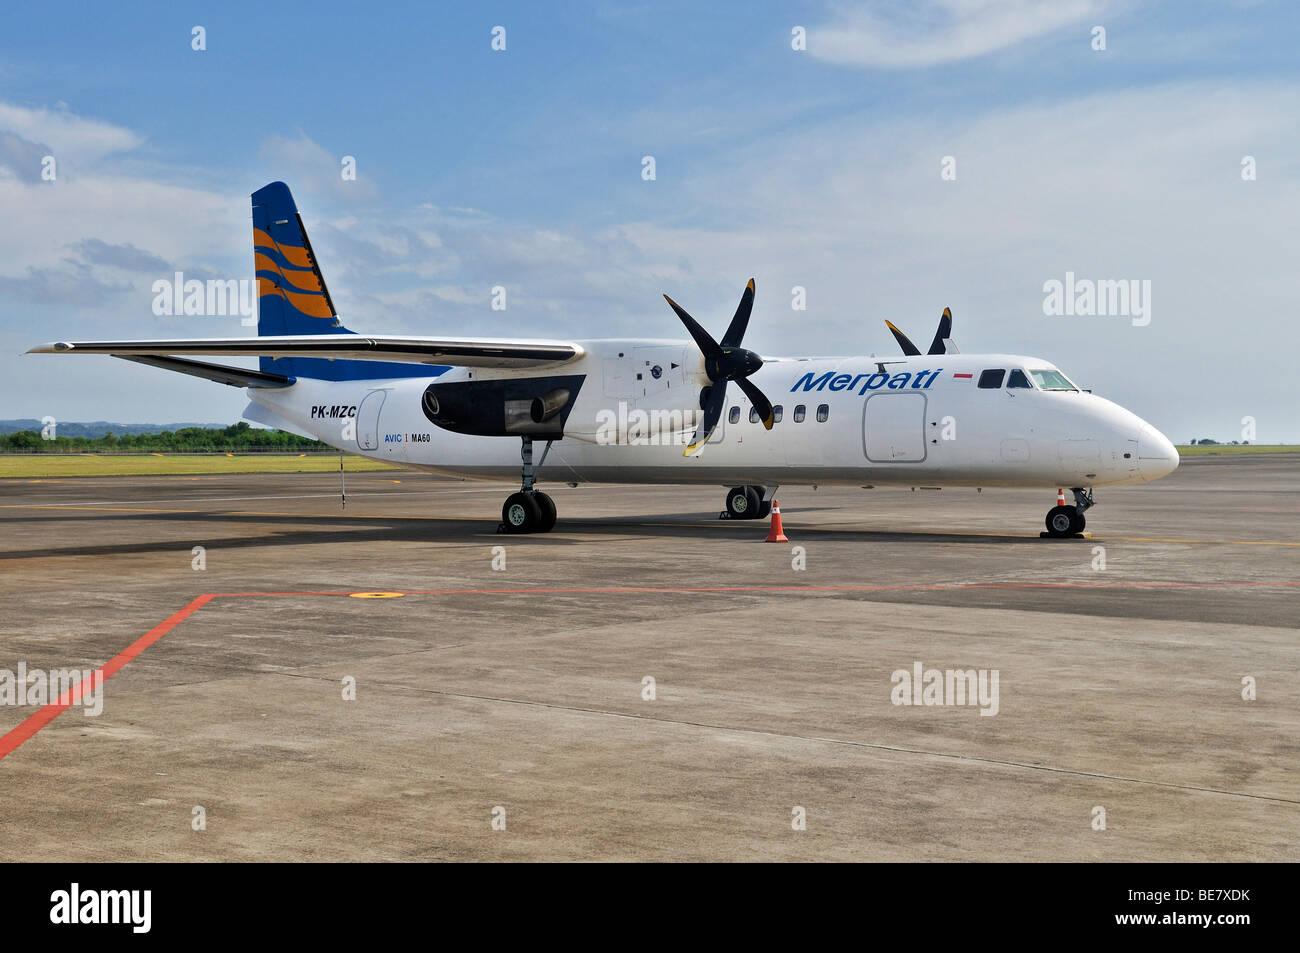 Merpati turboprop aircraft, airport, Denpasar, Bali, Indonesia, Southeast Asia - Stock Image